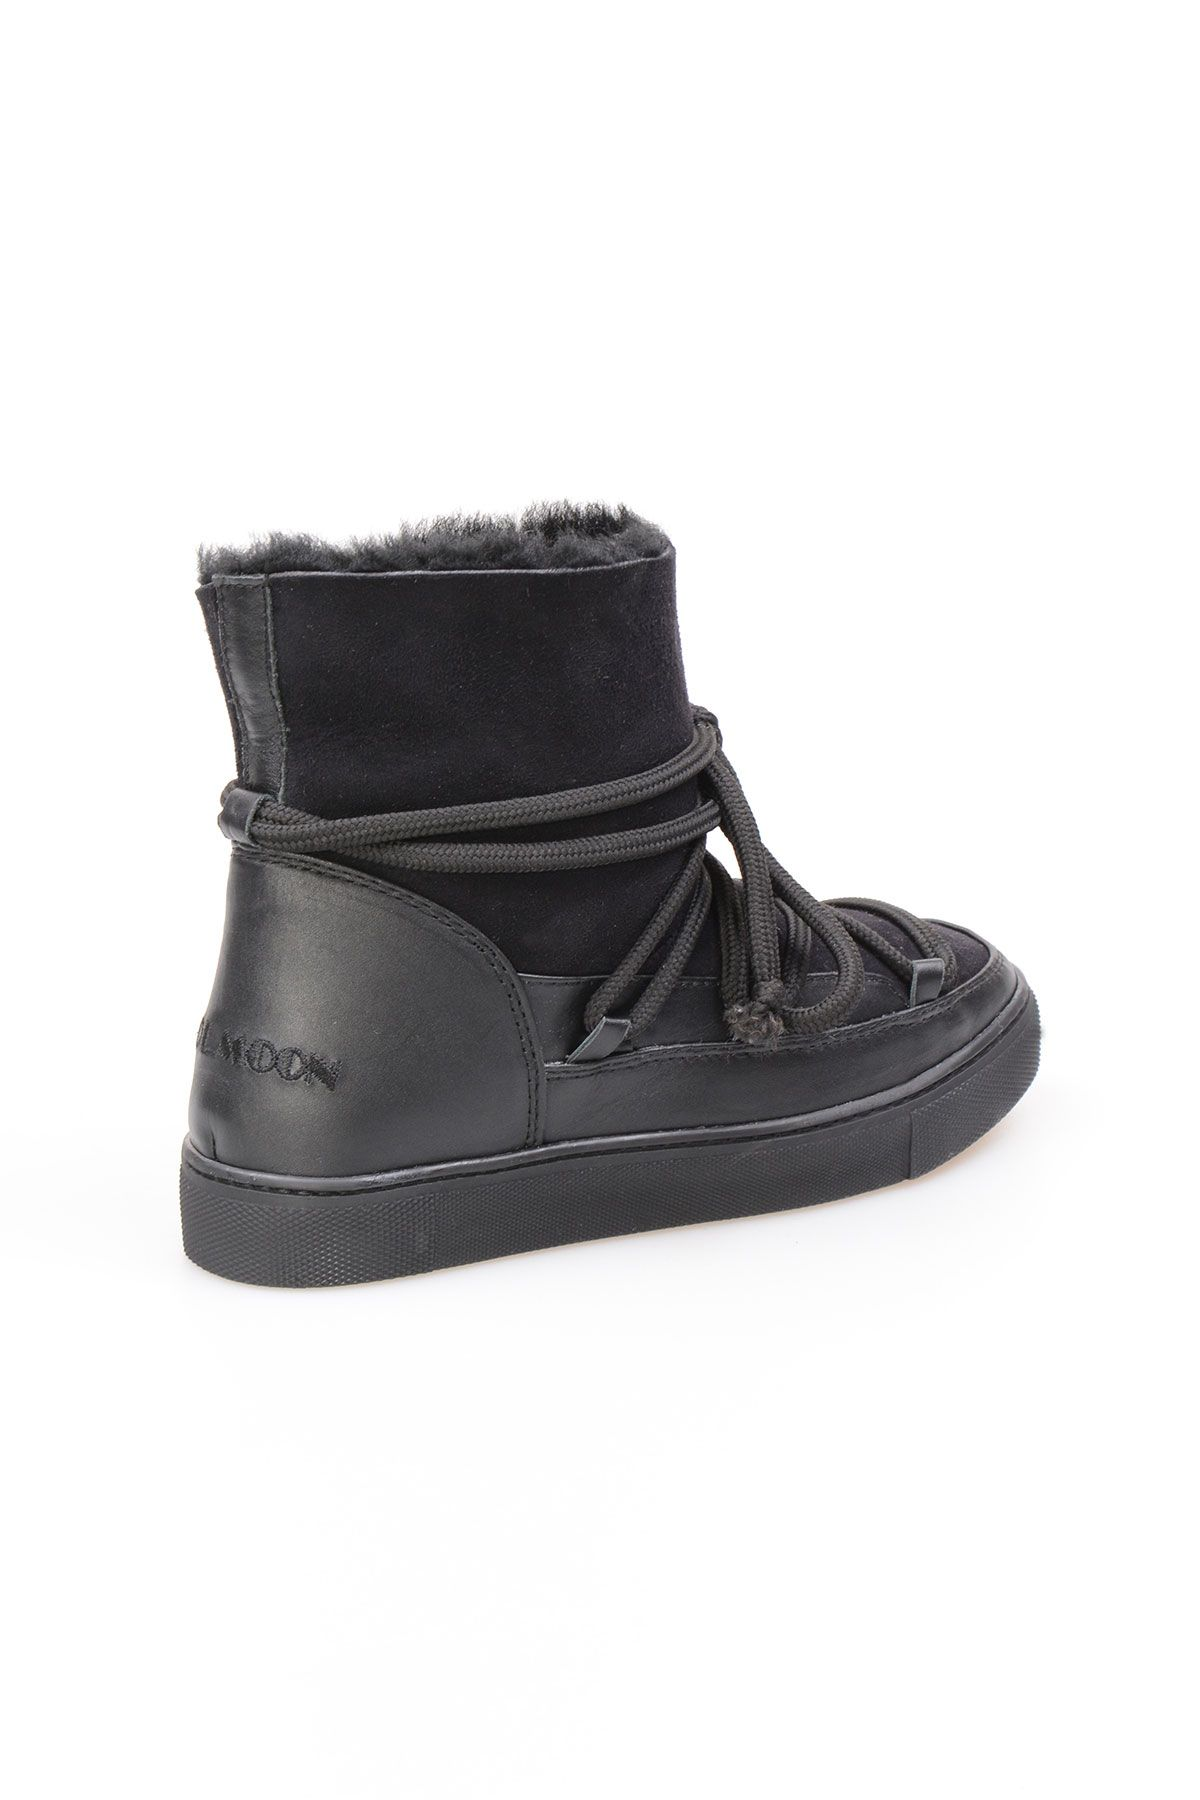 Cool Moon Genuine Suede Shearling Lined Women's Sneaker 355050 Black